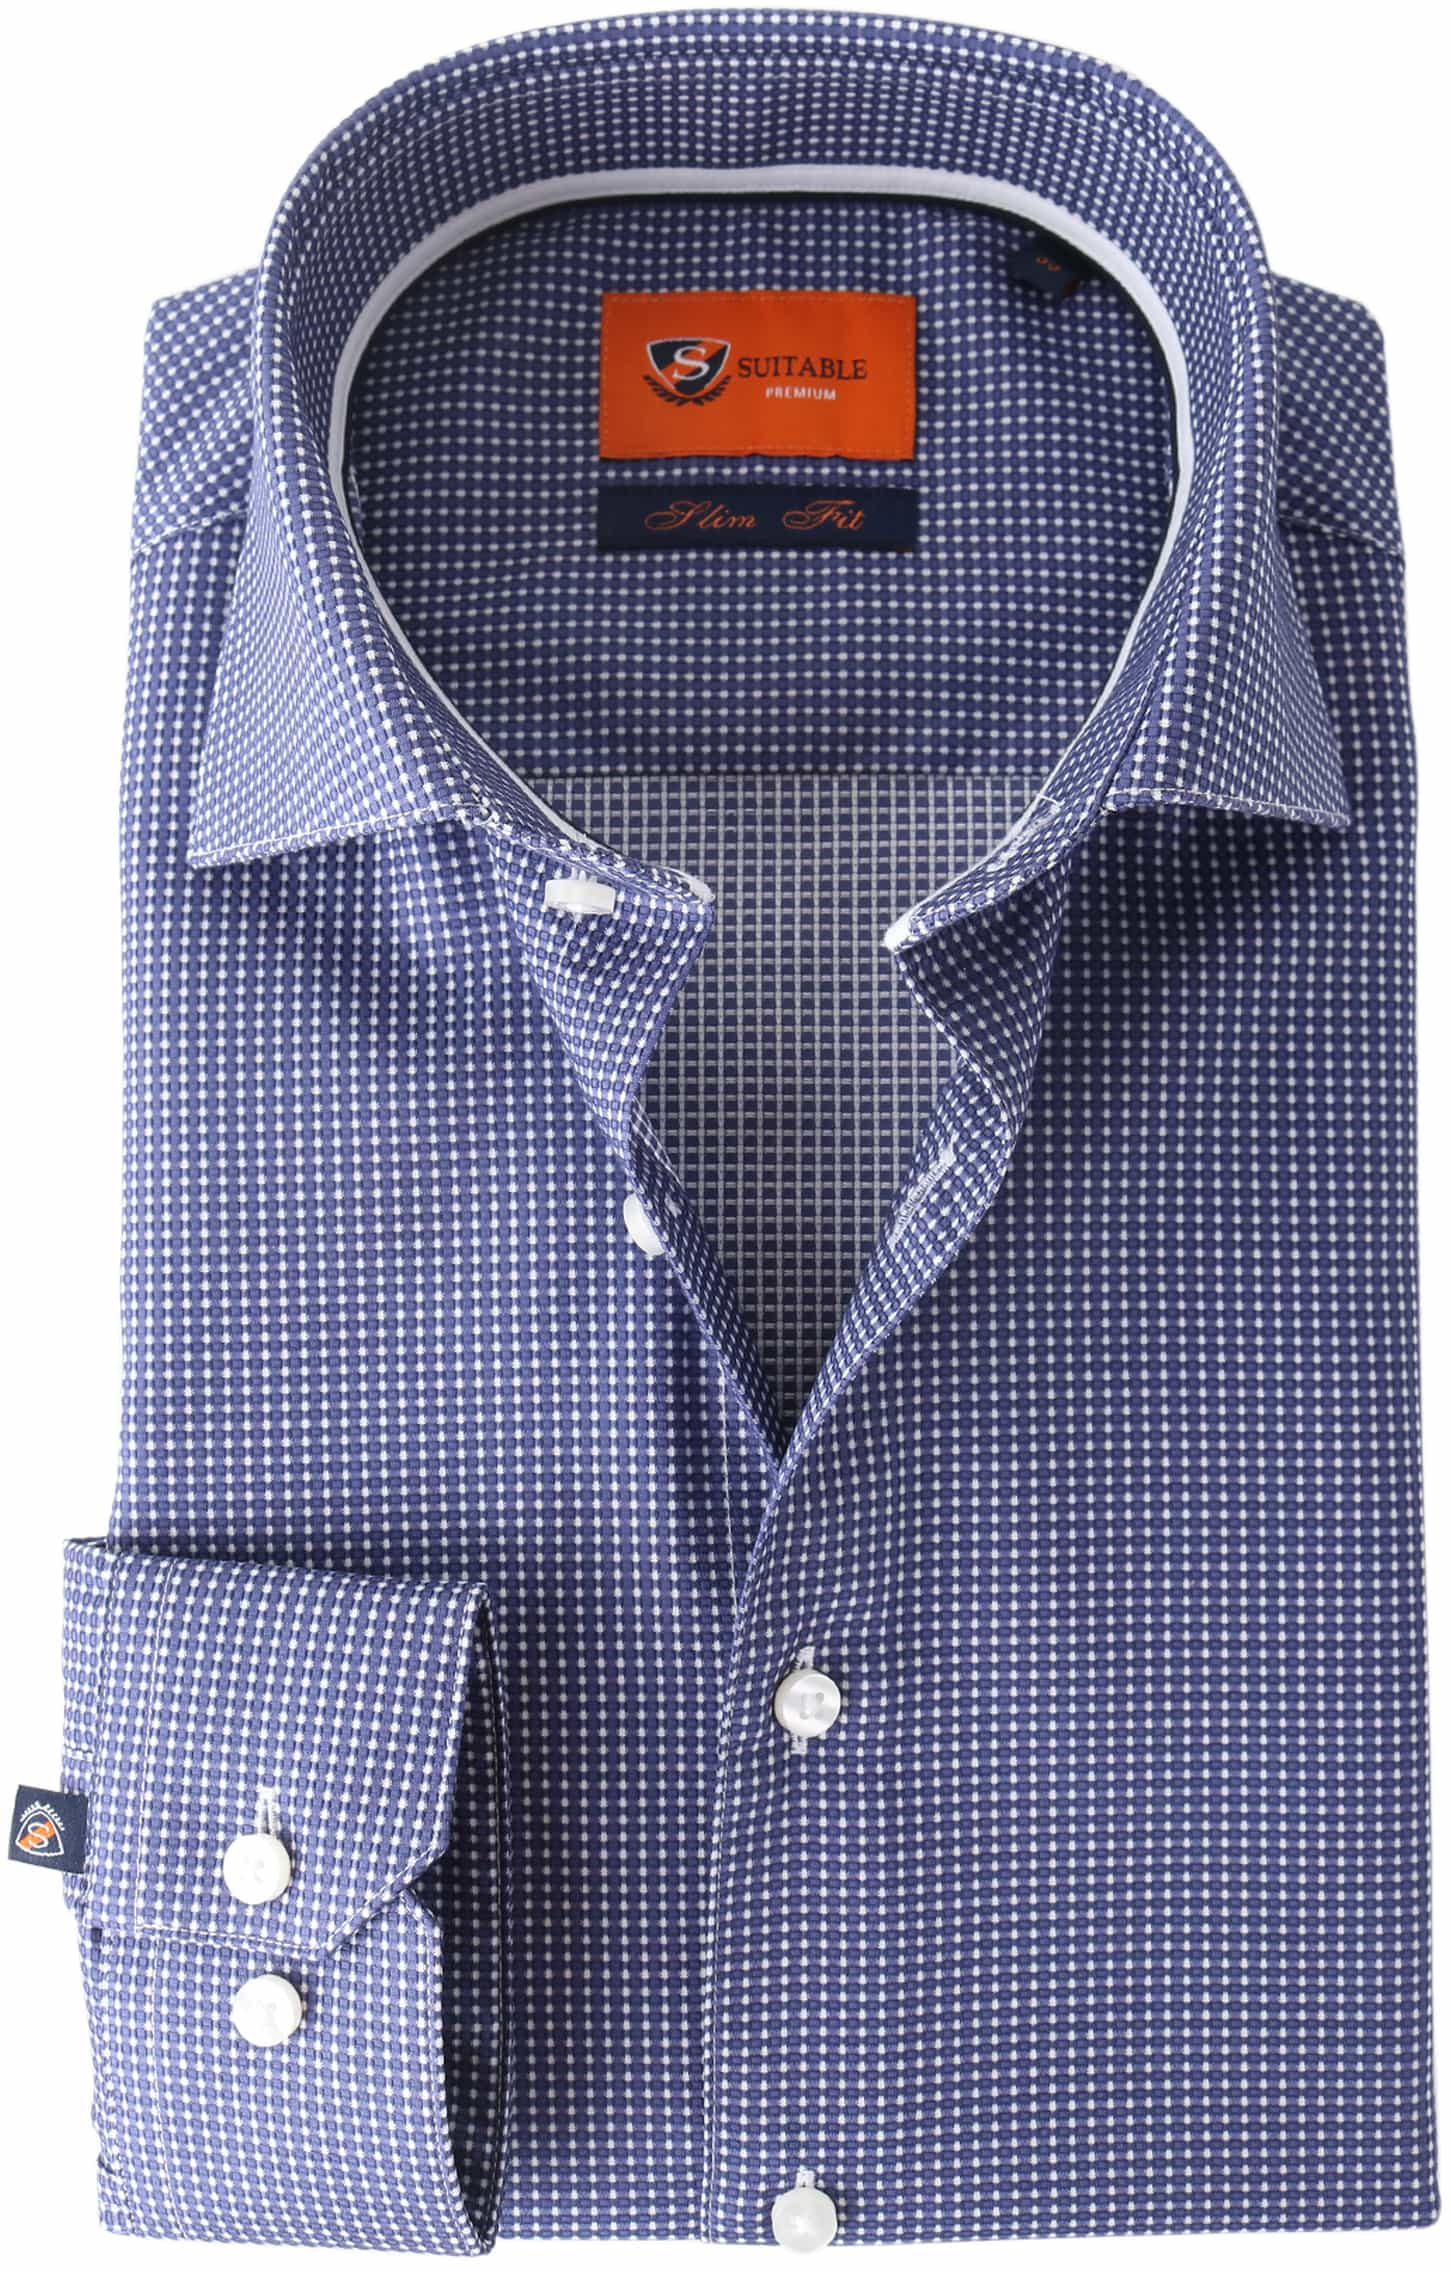 Suitable Overhemd Navy Checks Dot foto 0